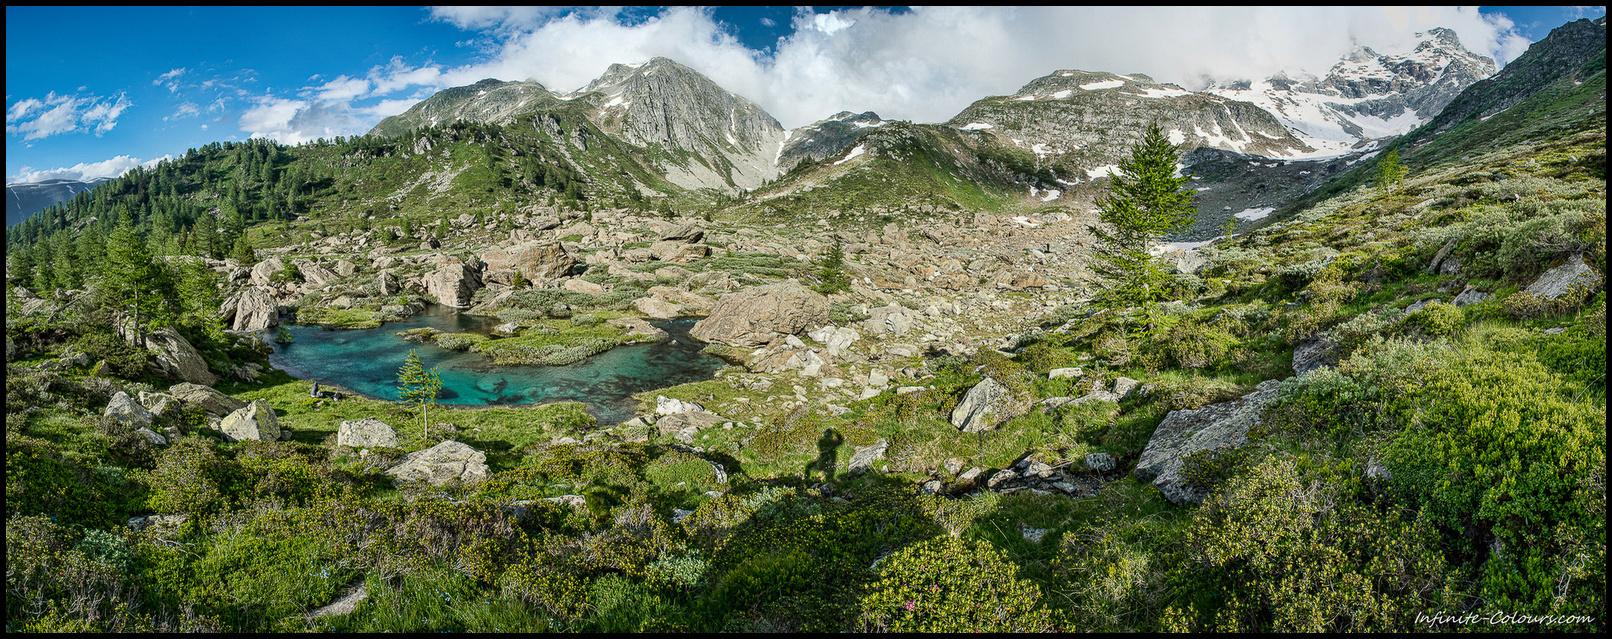 Mässerbach valley panorama